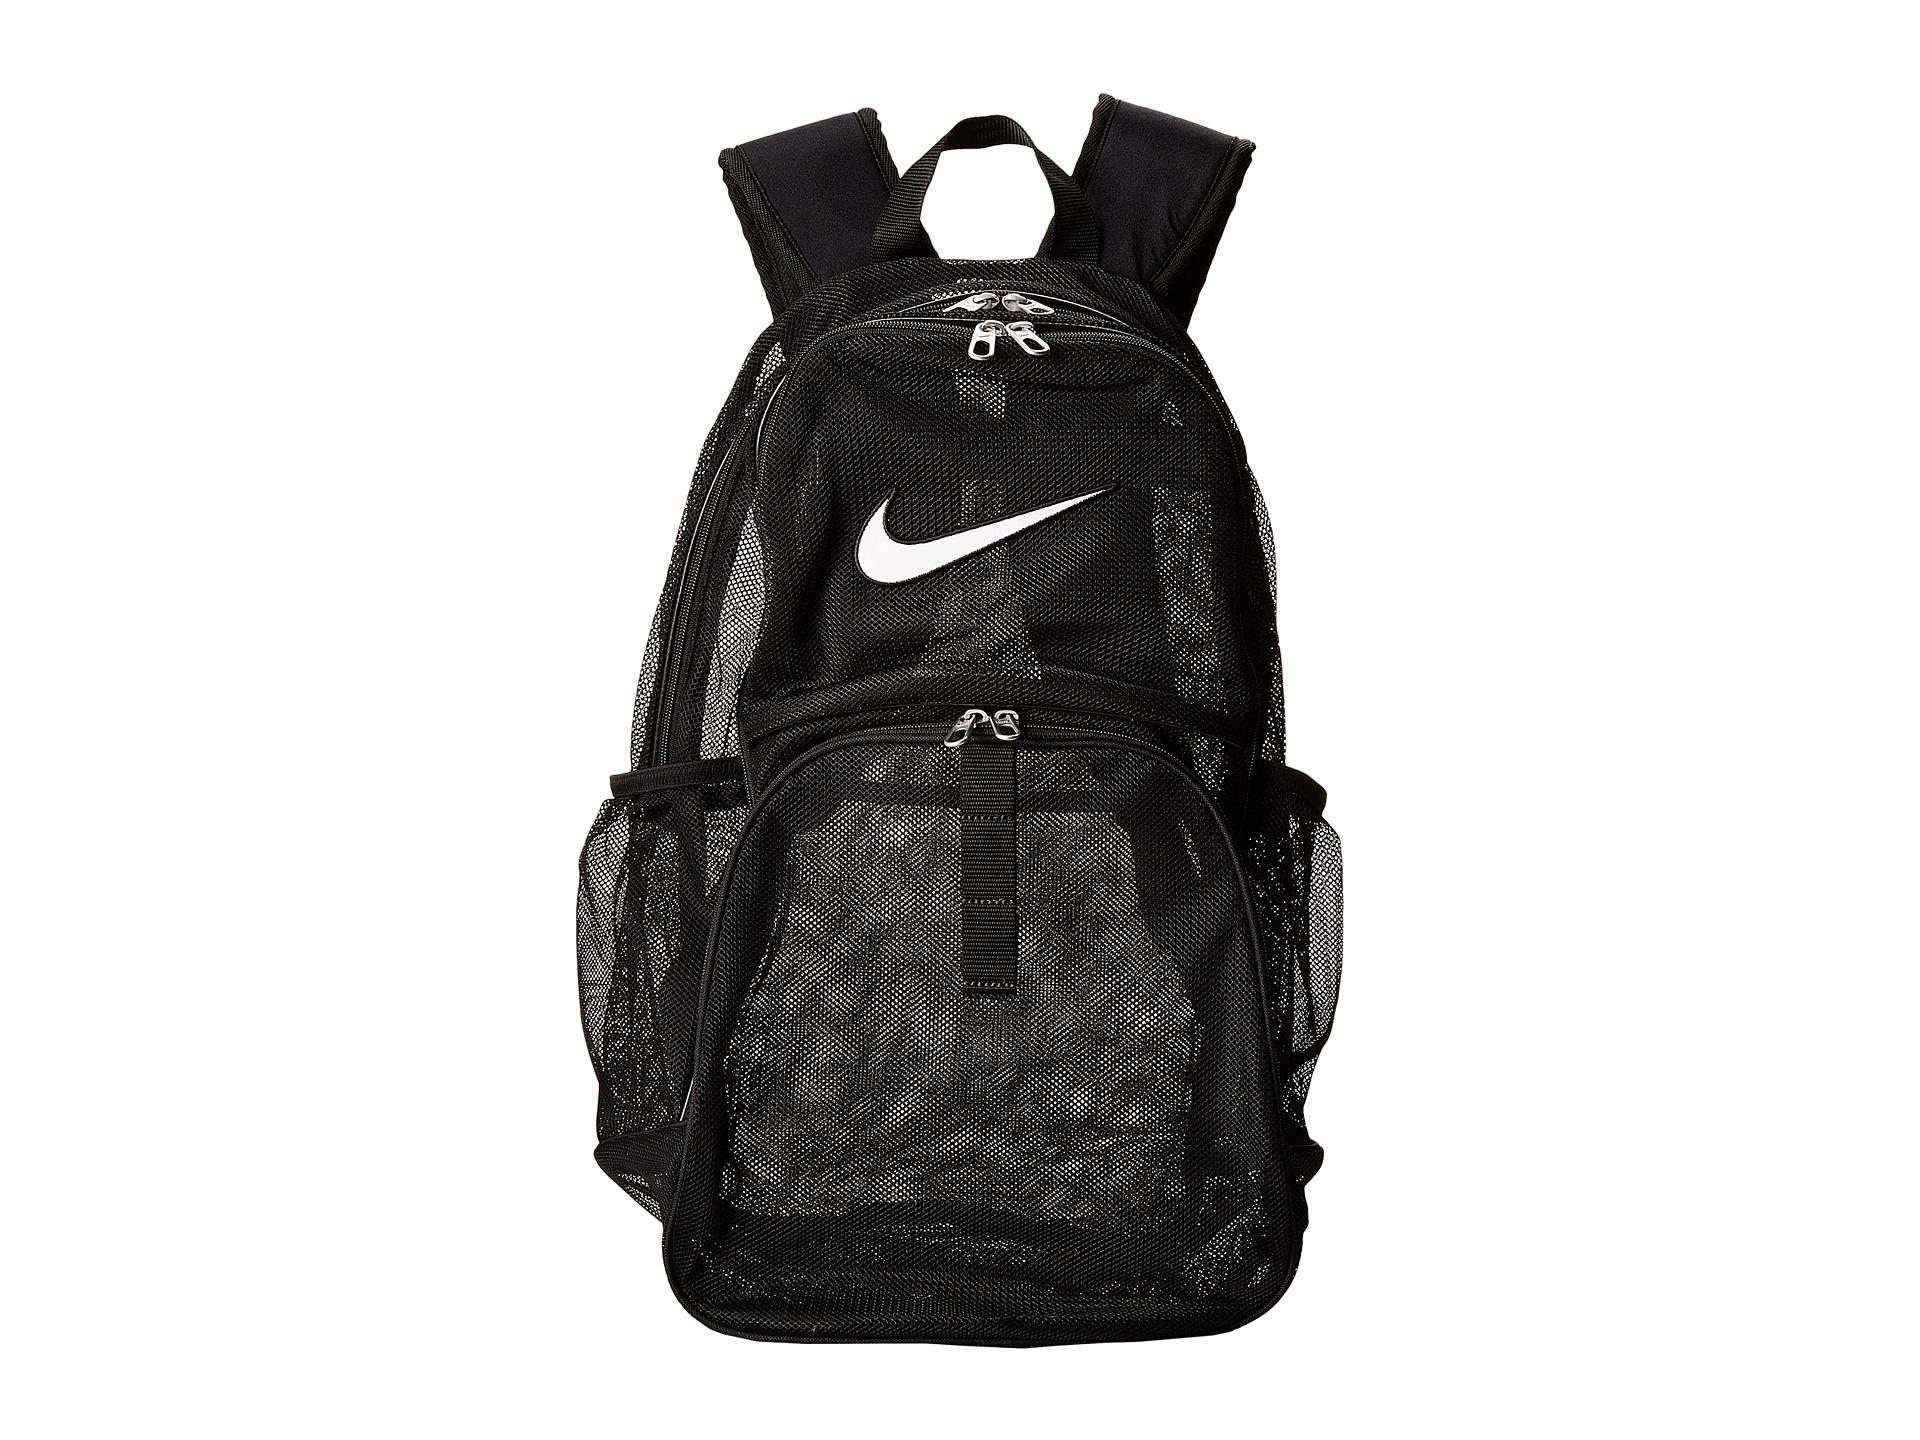 ... Backpack School Book  new product 5e475 ad252 Lyst - Nike Brasilia 6  Mesh Xl in Black ... 2fb4b8b308